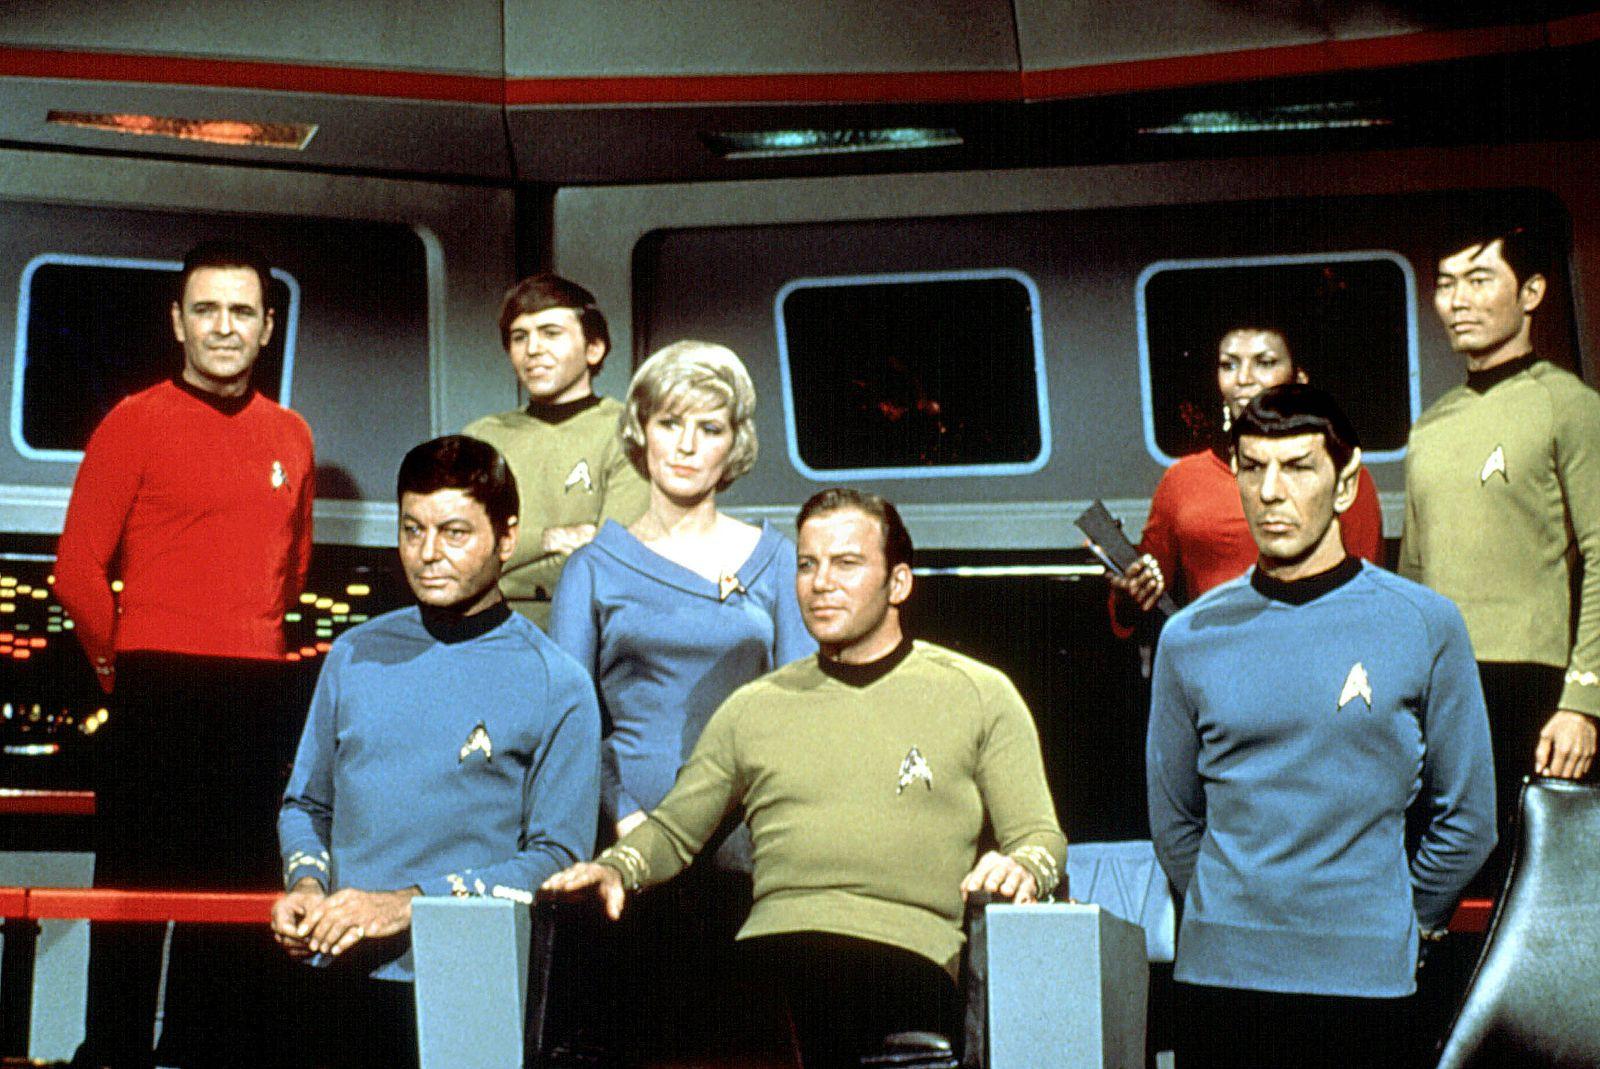 STAR TREK, James Doohan, DeForest Kelley, Walter Koenig, Majel Barrett, William Shatner, Nichelle Nichols, Leonard Nimoy